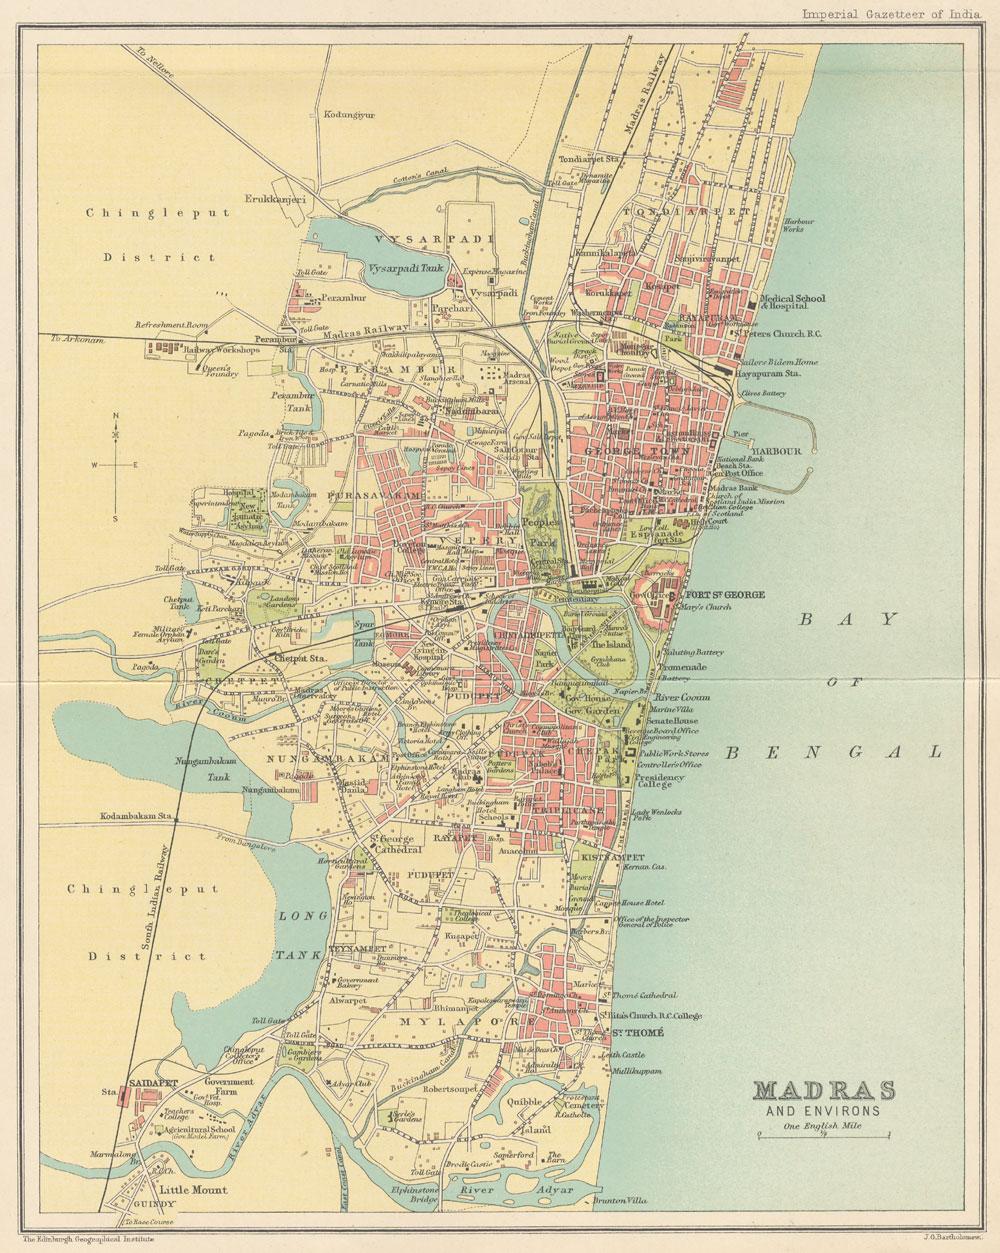 Speculation on Property in Chennai: Location Kolathur